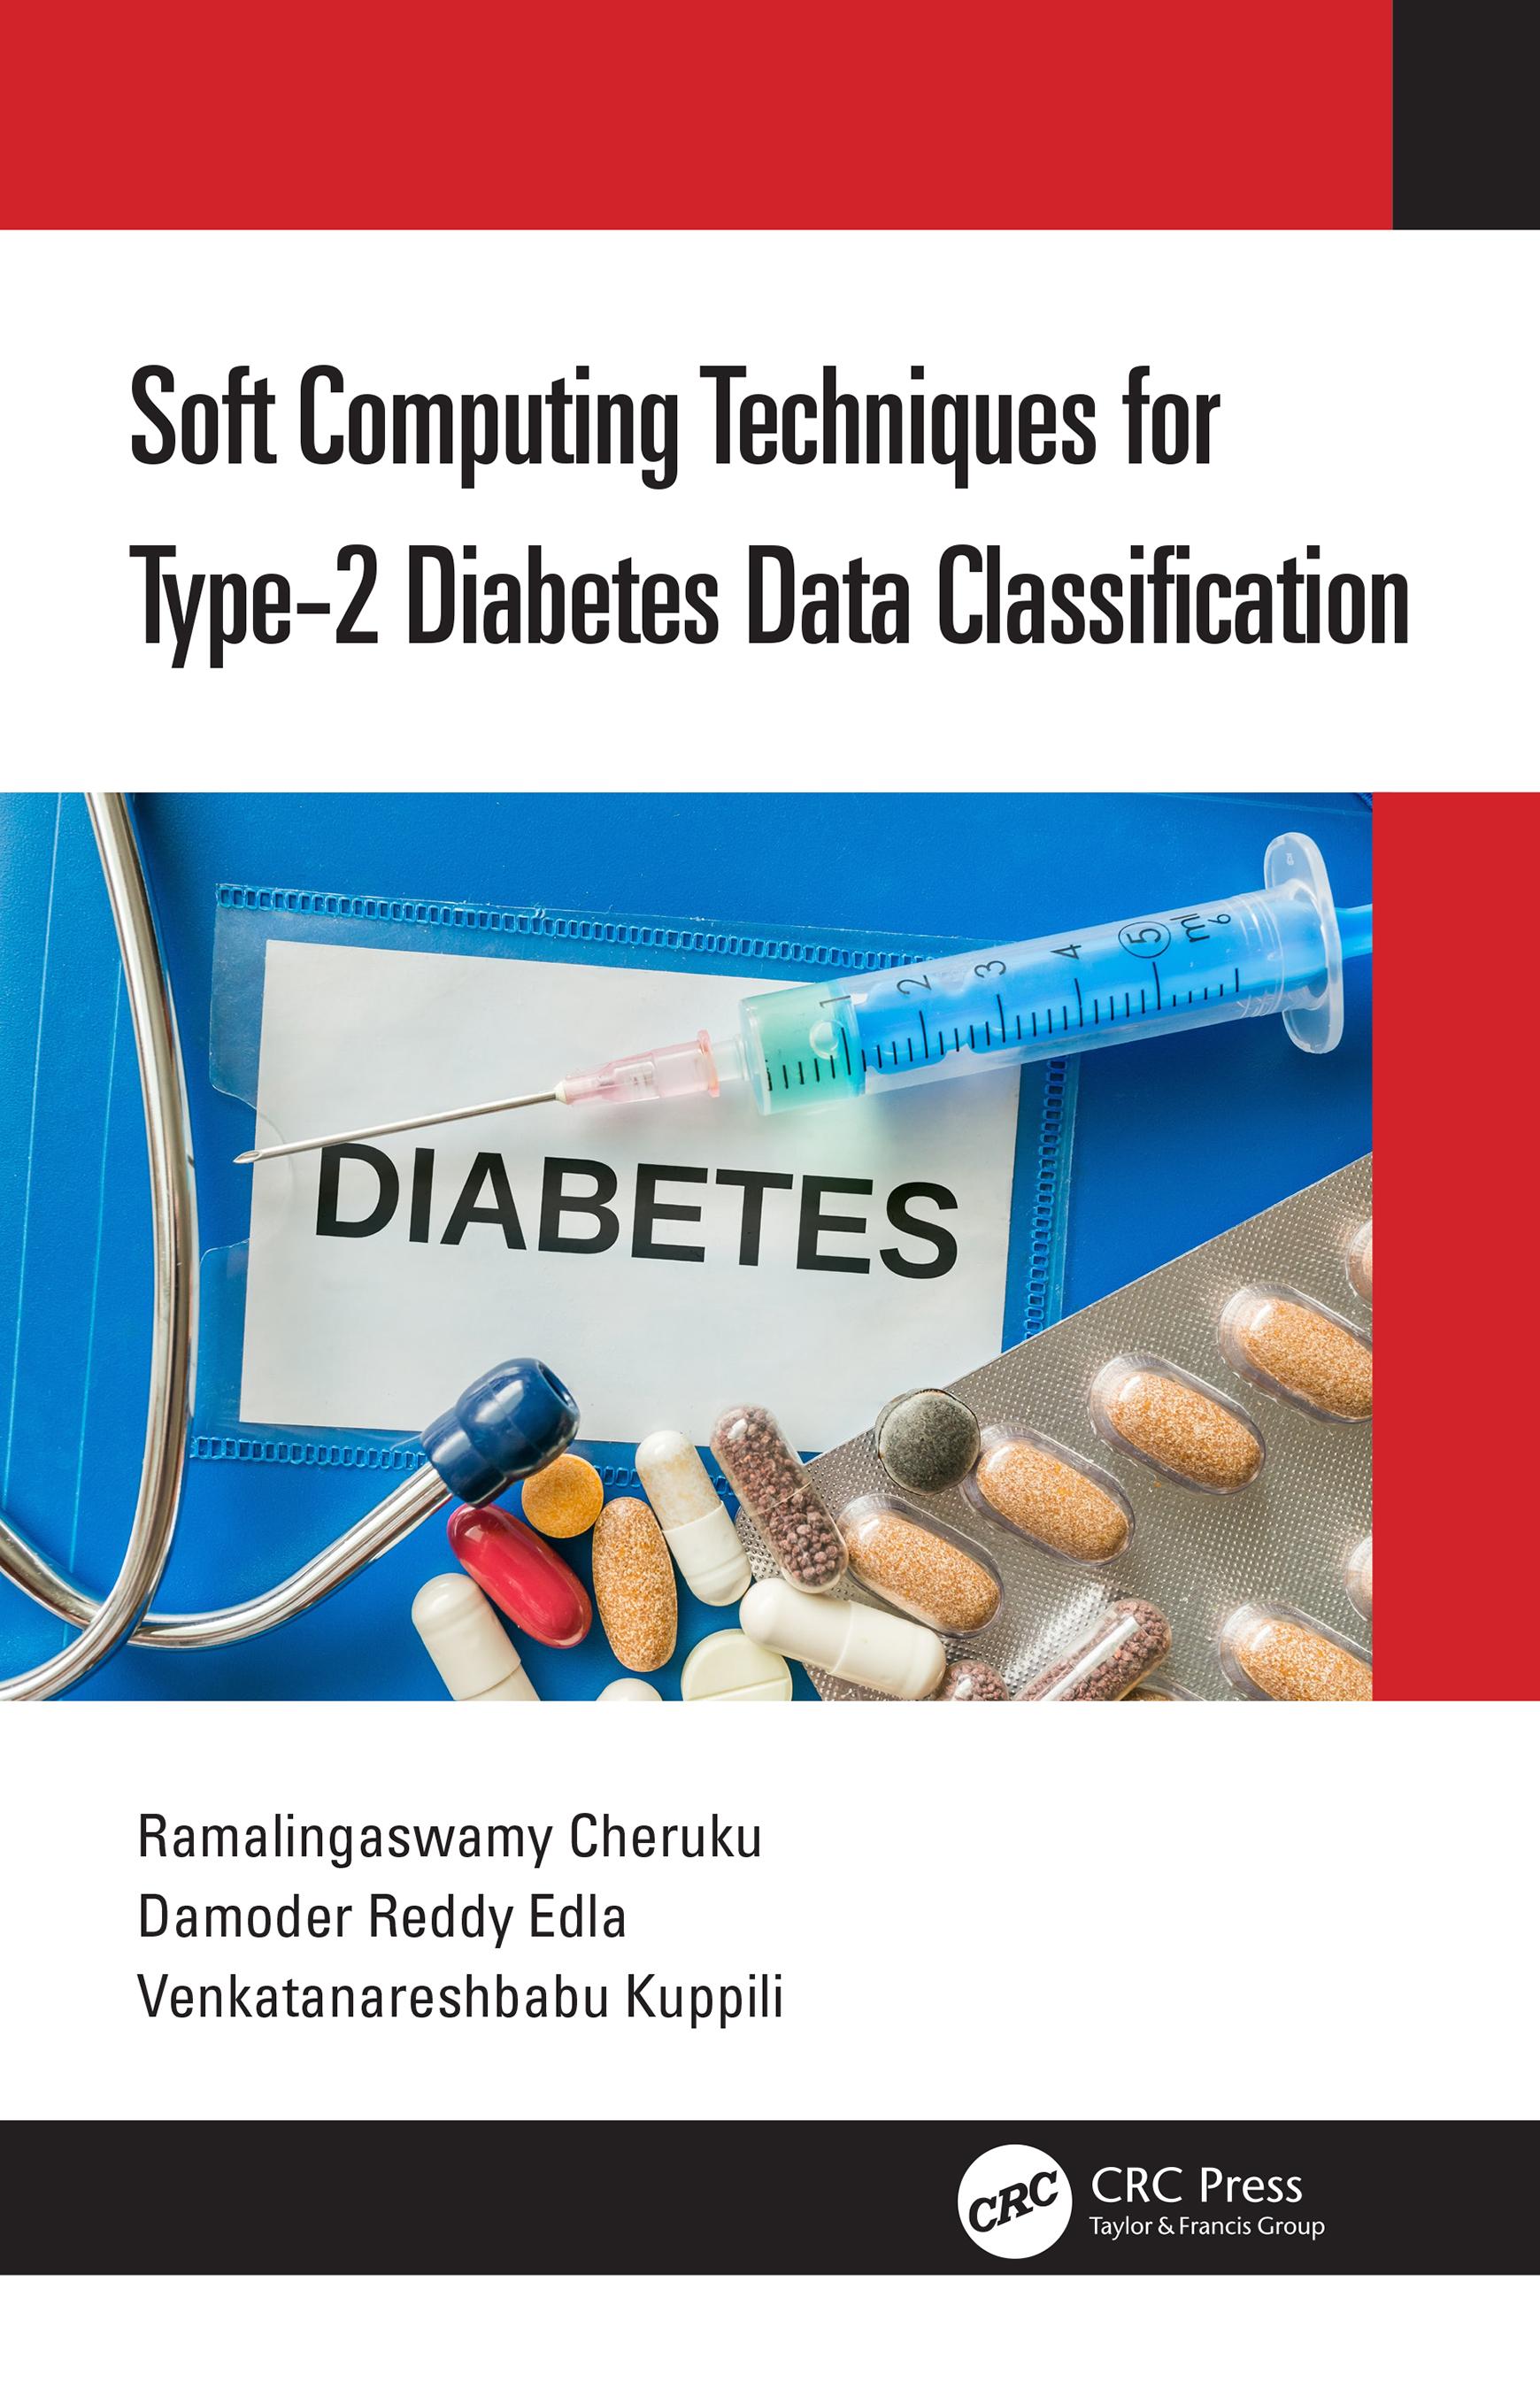 Classification of Type-2 Diabetes using Bat-based Fuzzy Rule Miner